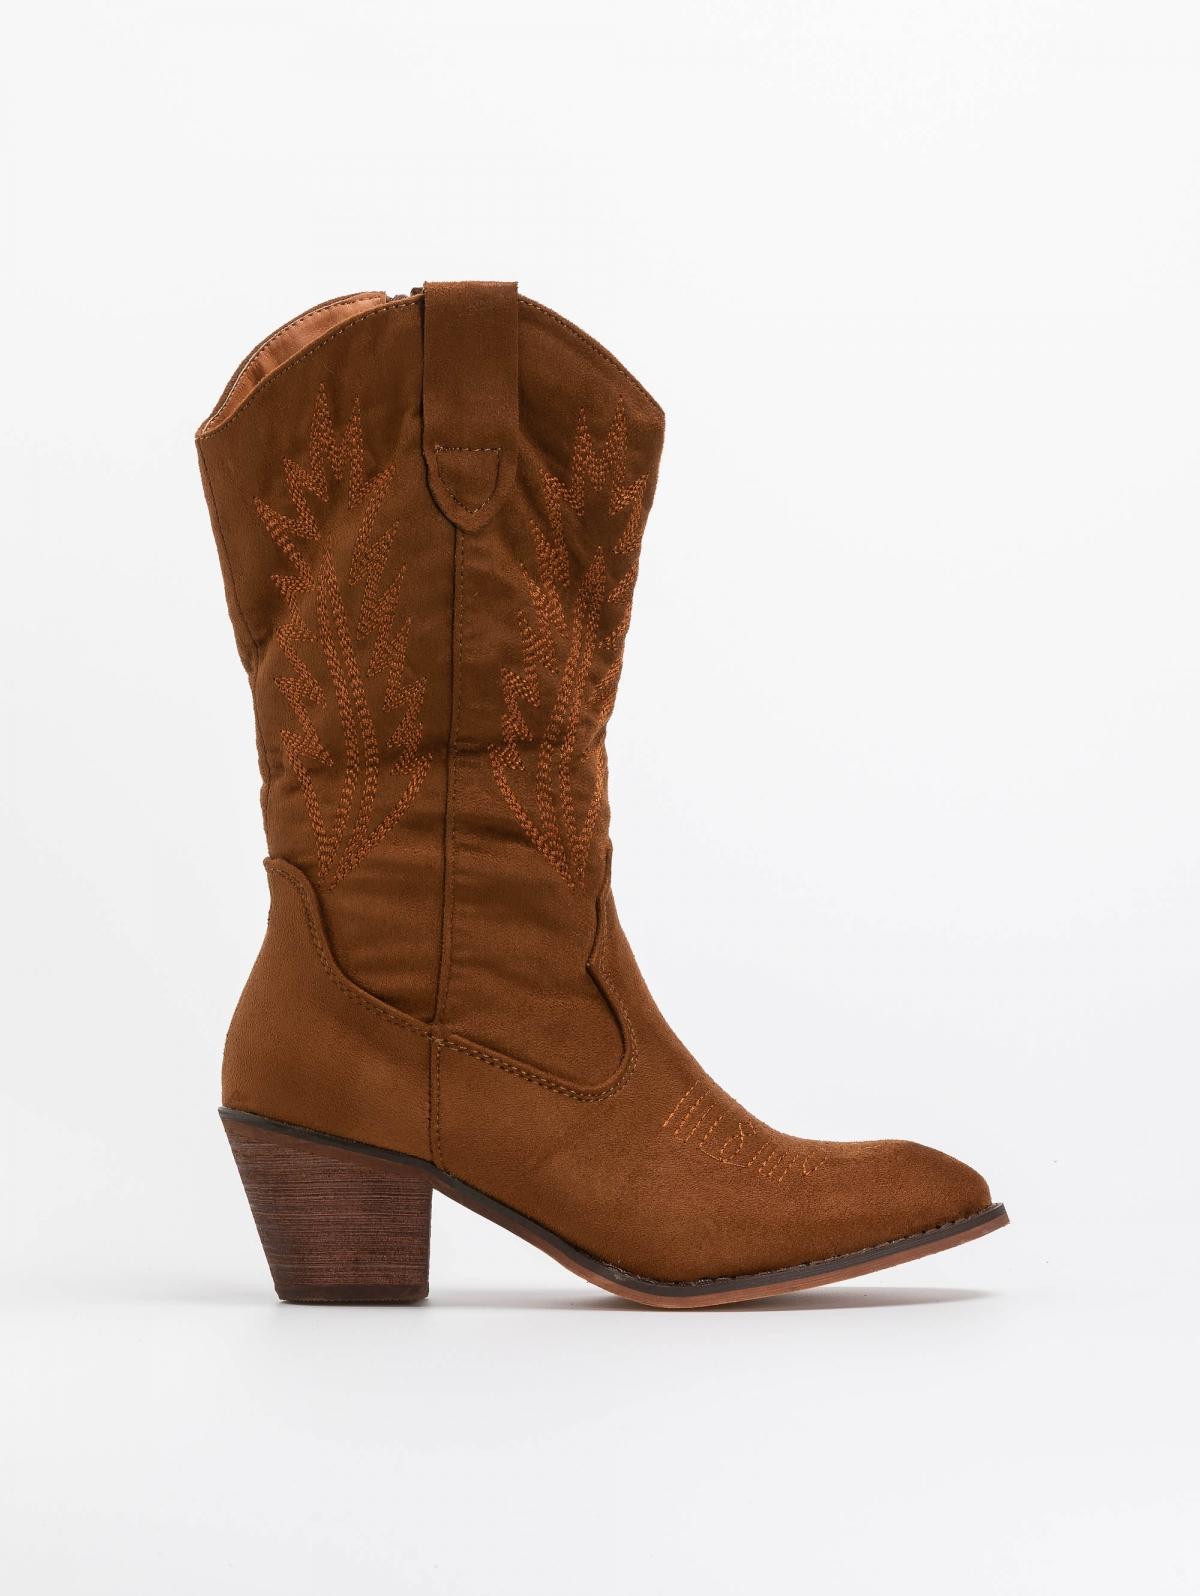 Suede western μπότες με ξύλινο τακούνι - Ταμπά